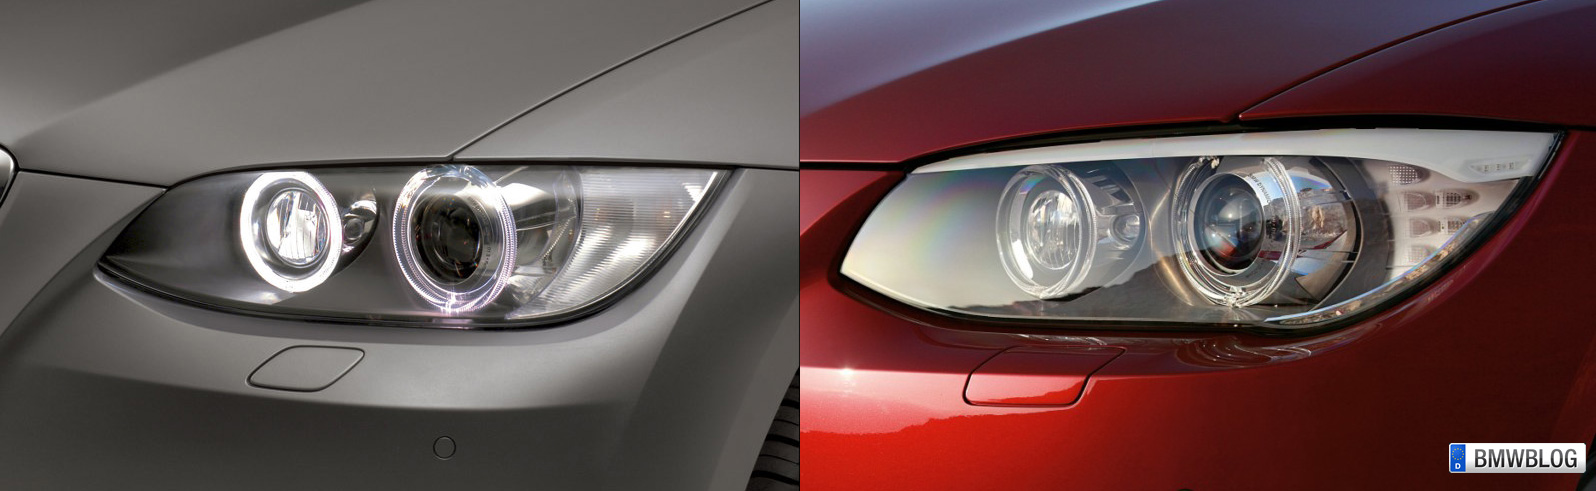 Photo Comparison E92 Coupe Facelift Vs Pre Facelift